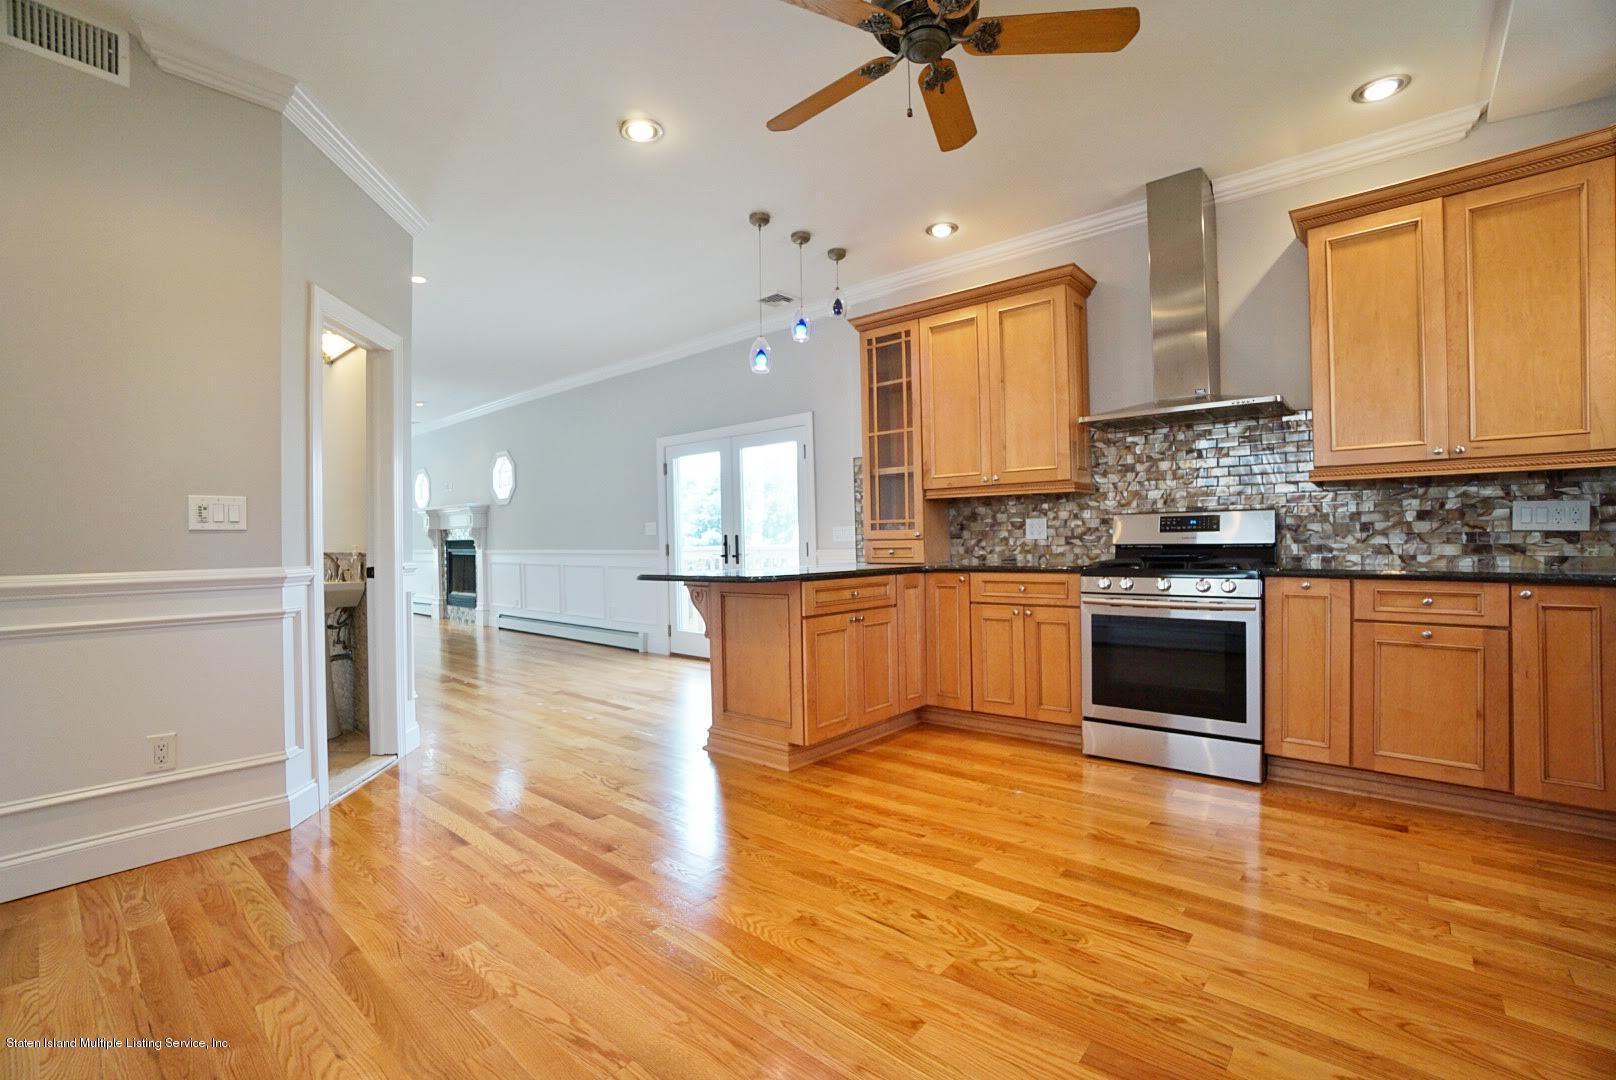 Single Family - Detached 445 Manhattan Street  Staten Island, NY 10307, MLS-1130505-11